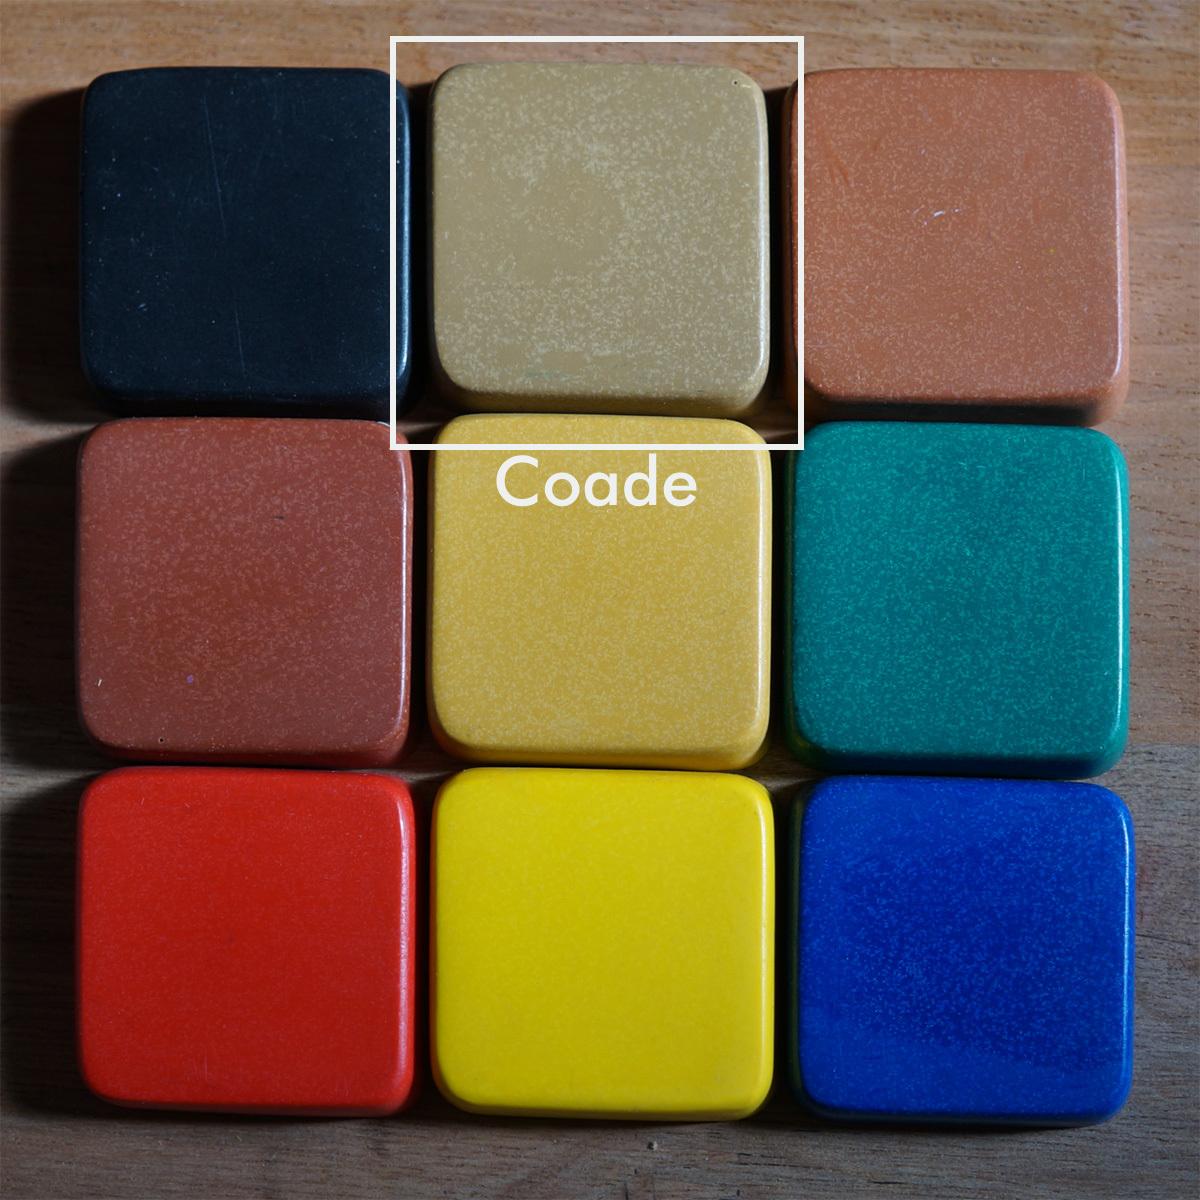 PIGMENT COADE 300g(着色剤:コード 300g) - 画像2